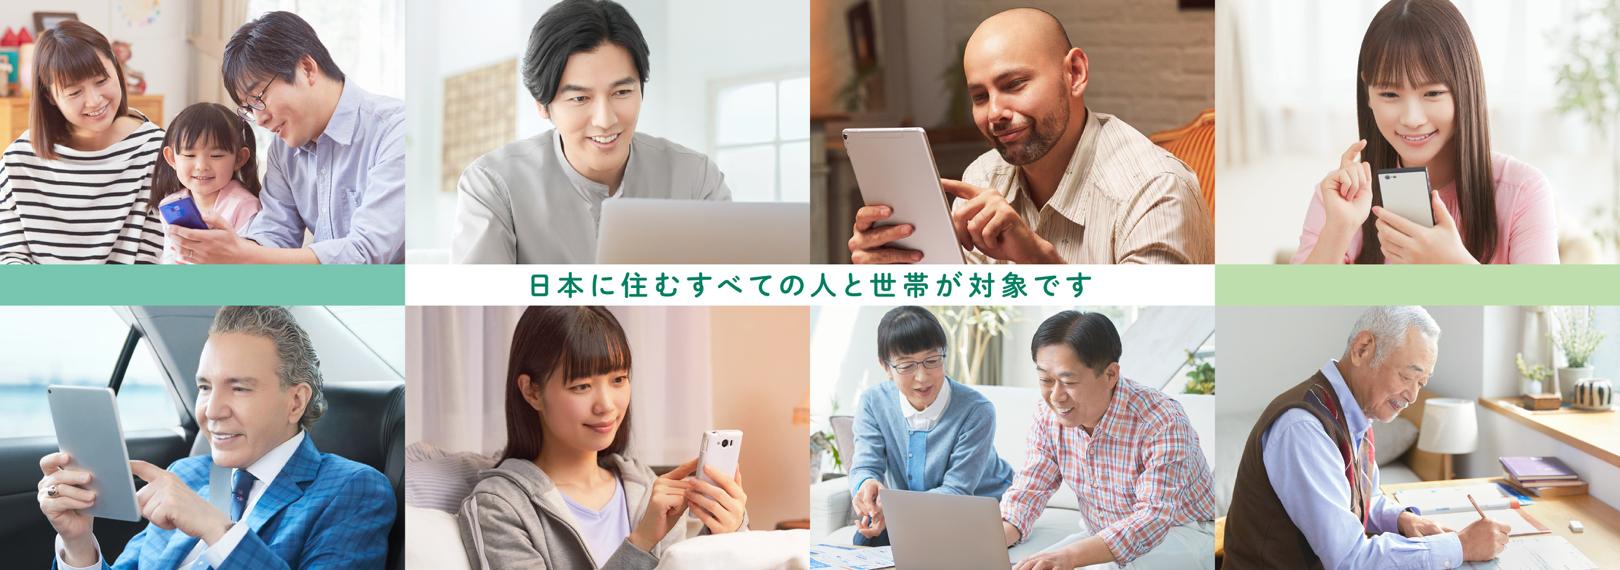 f:id:Imamura:20200930205302j:plain